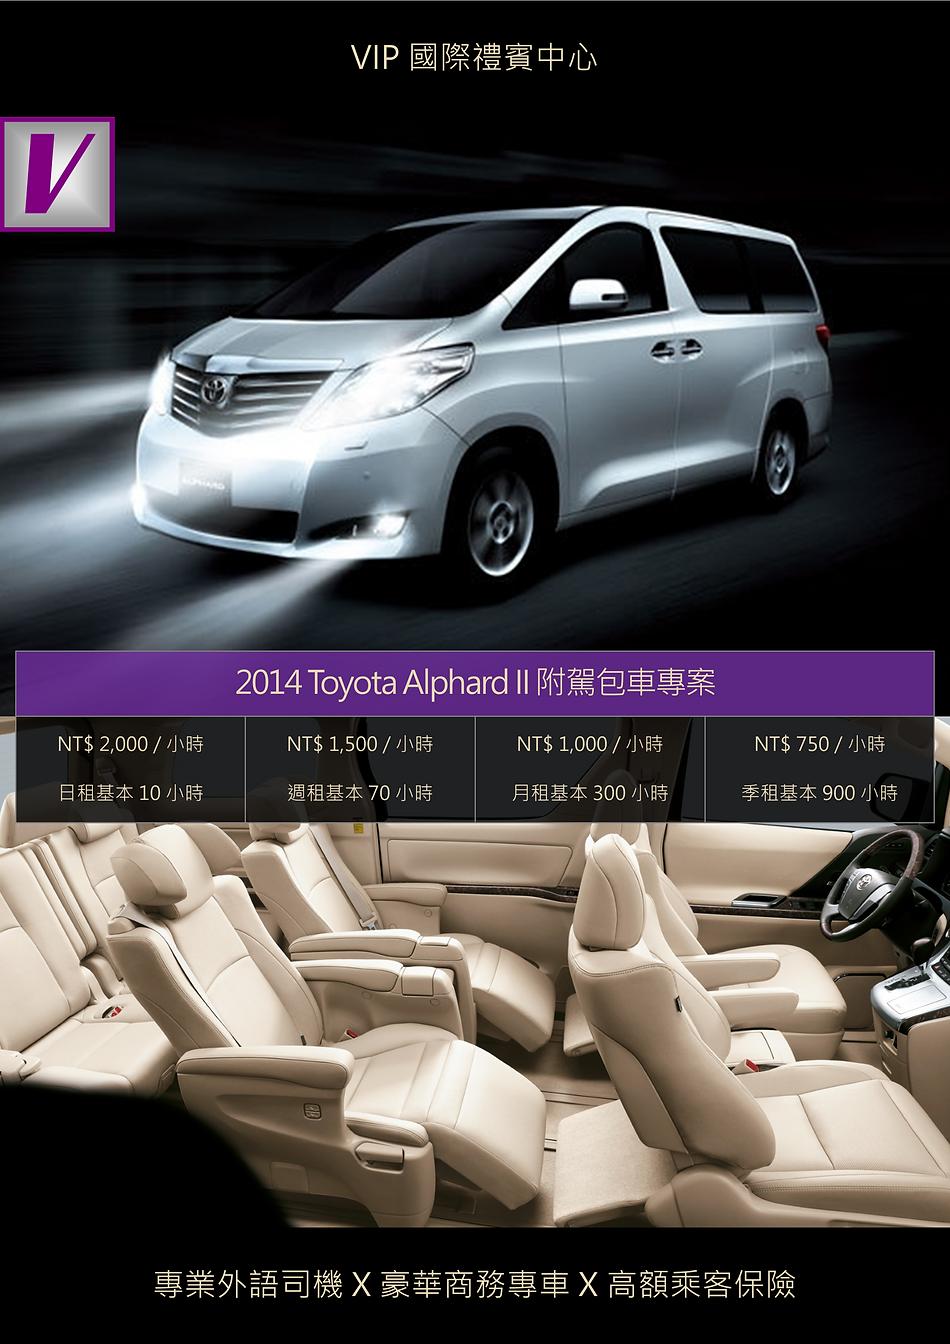 VIP國際禮賓中心 2014 TOYOTA ALPHARD II 附駕包車專案 DM.png